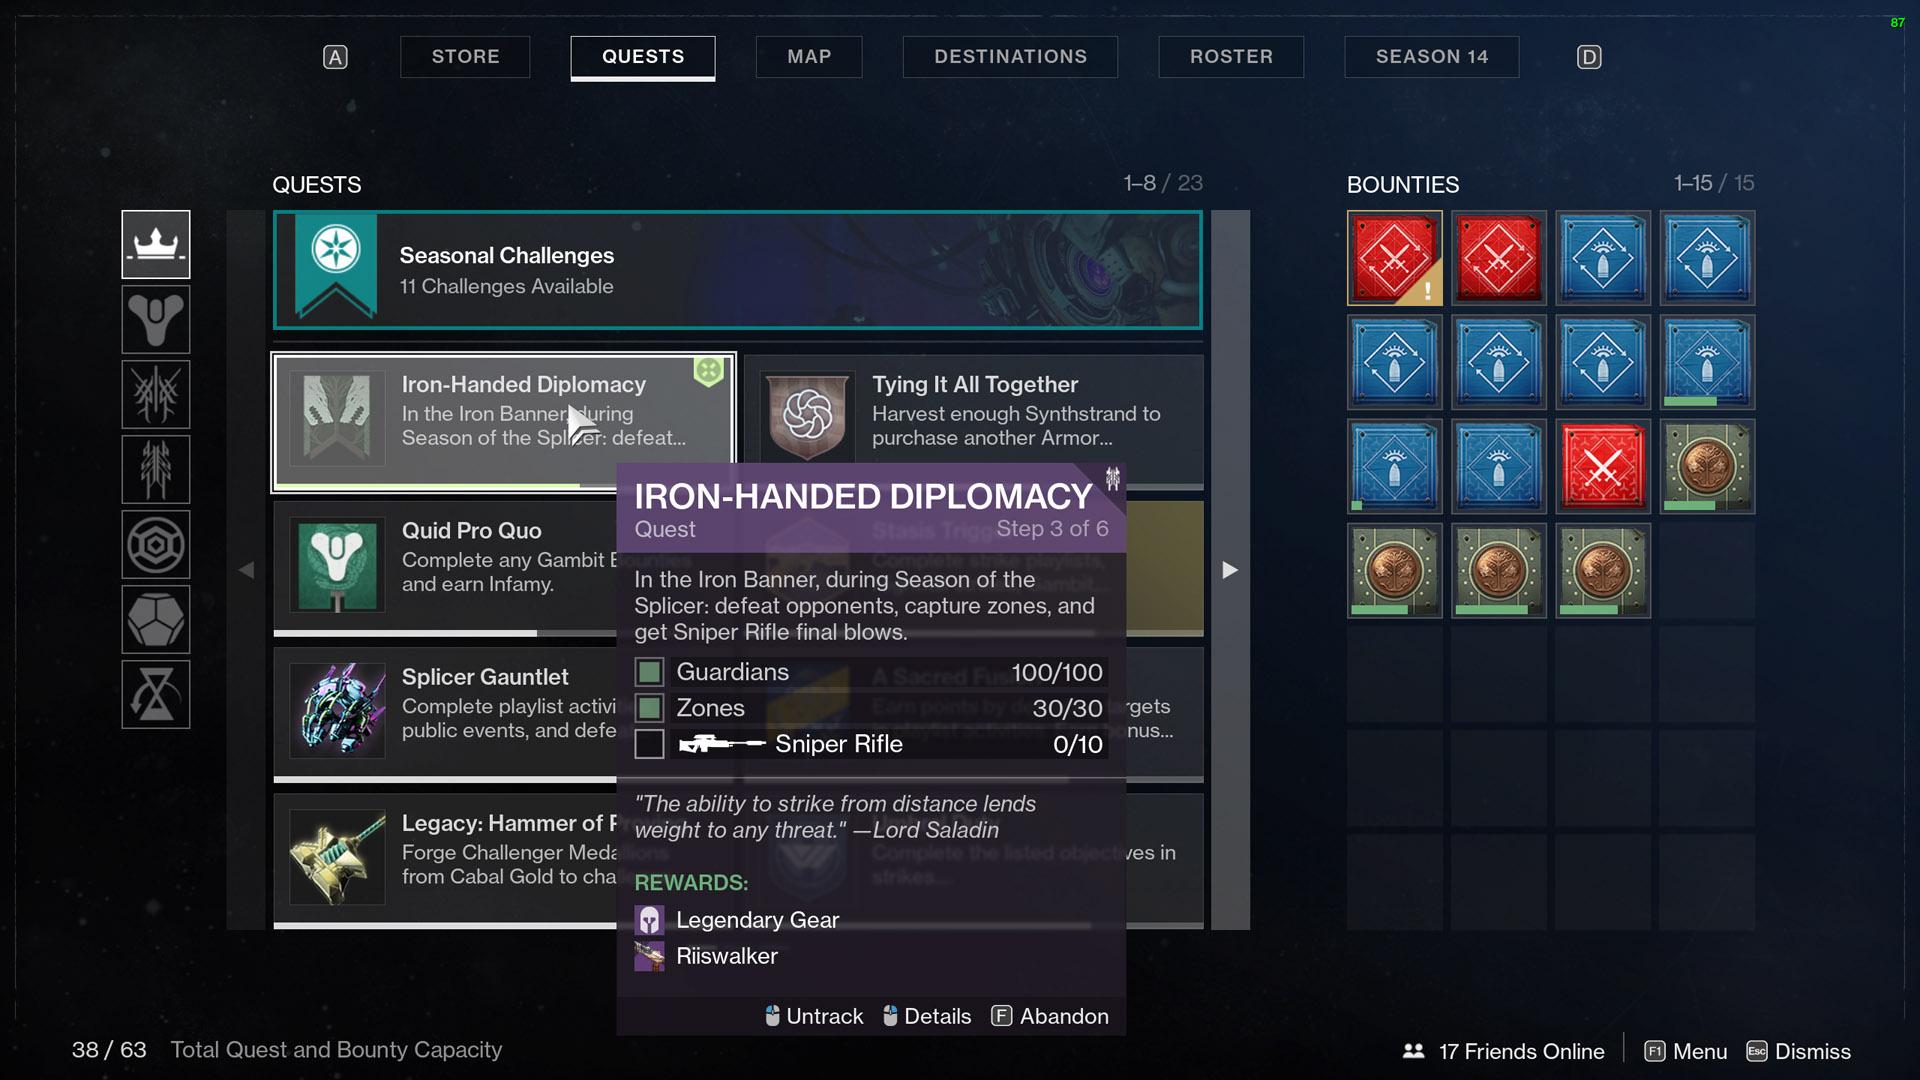 destiny 2 iron banner season 14 quest